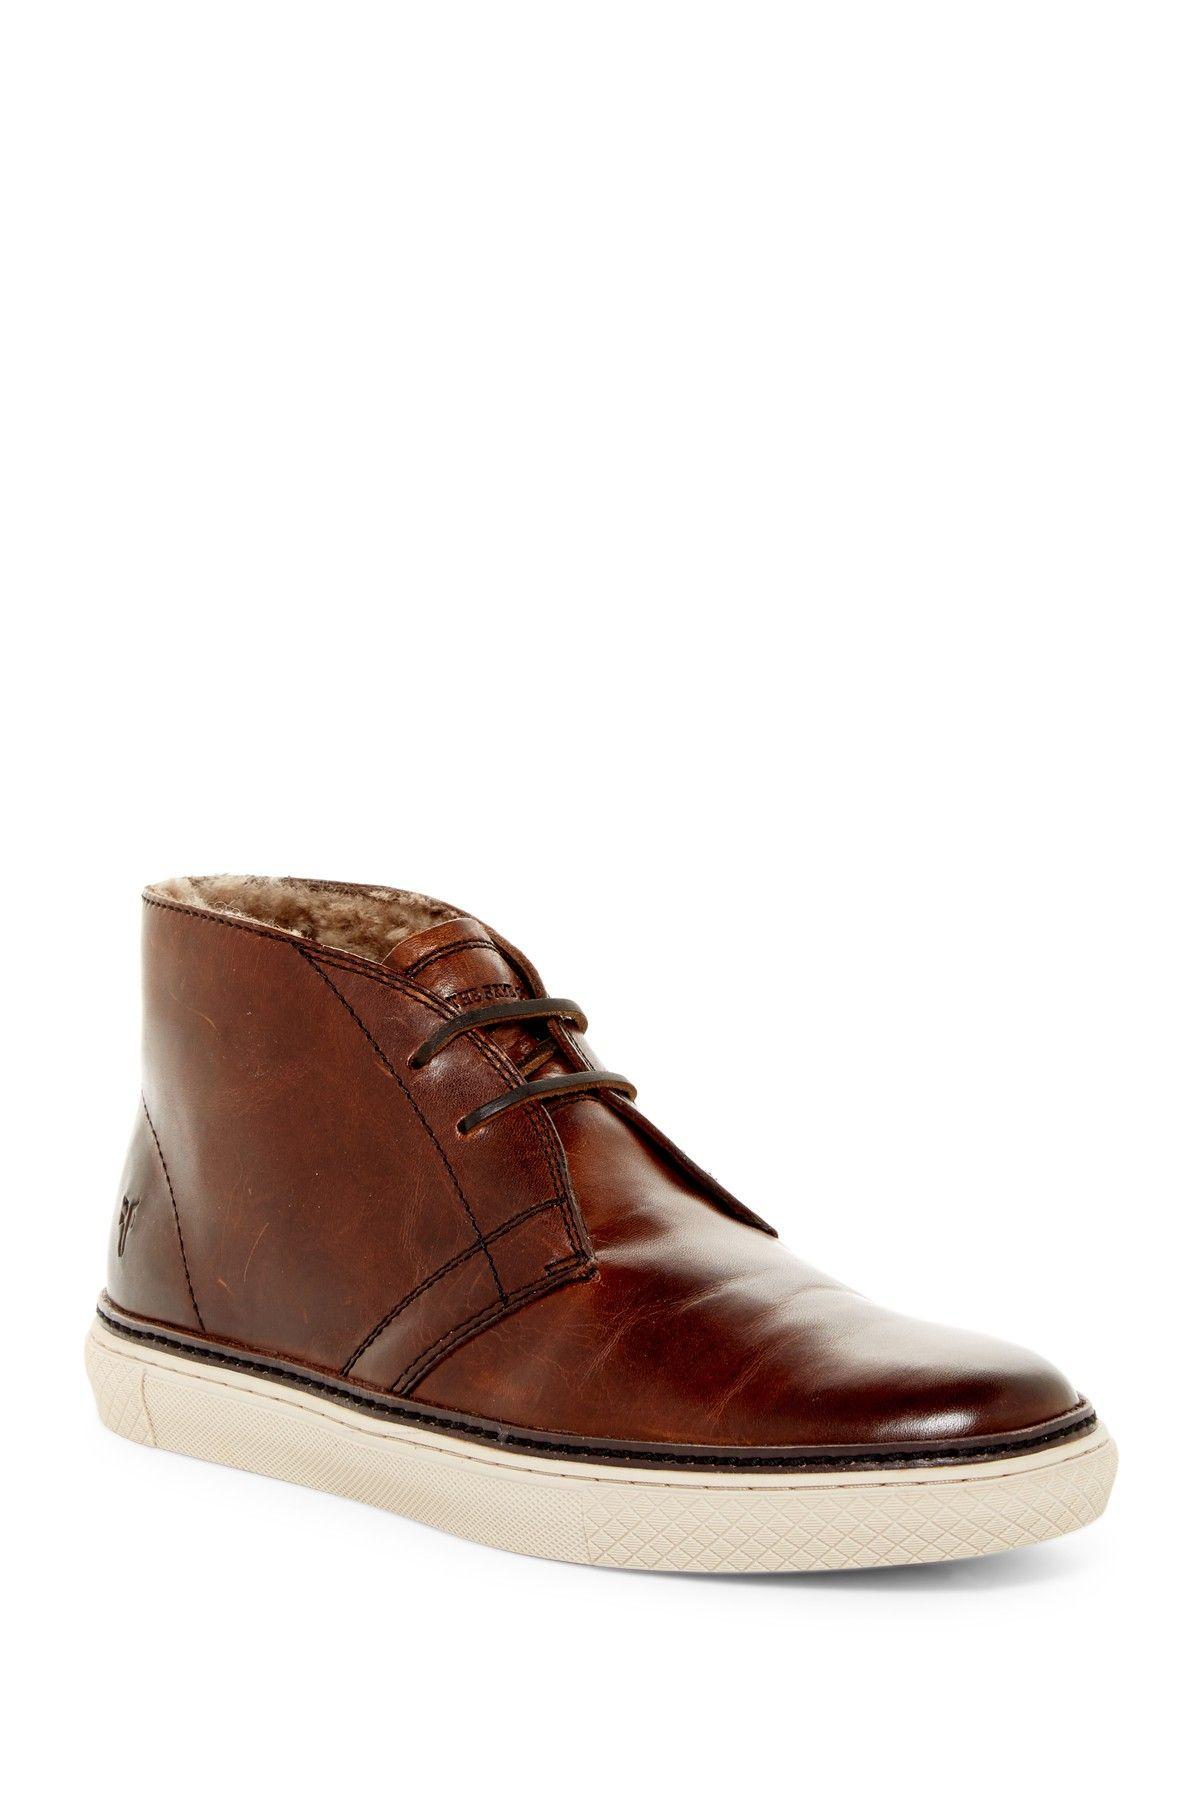 Frye Gates Genuine Shearling Lined Chukka Sneaker